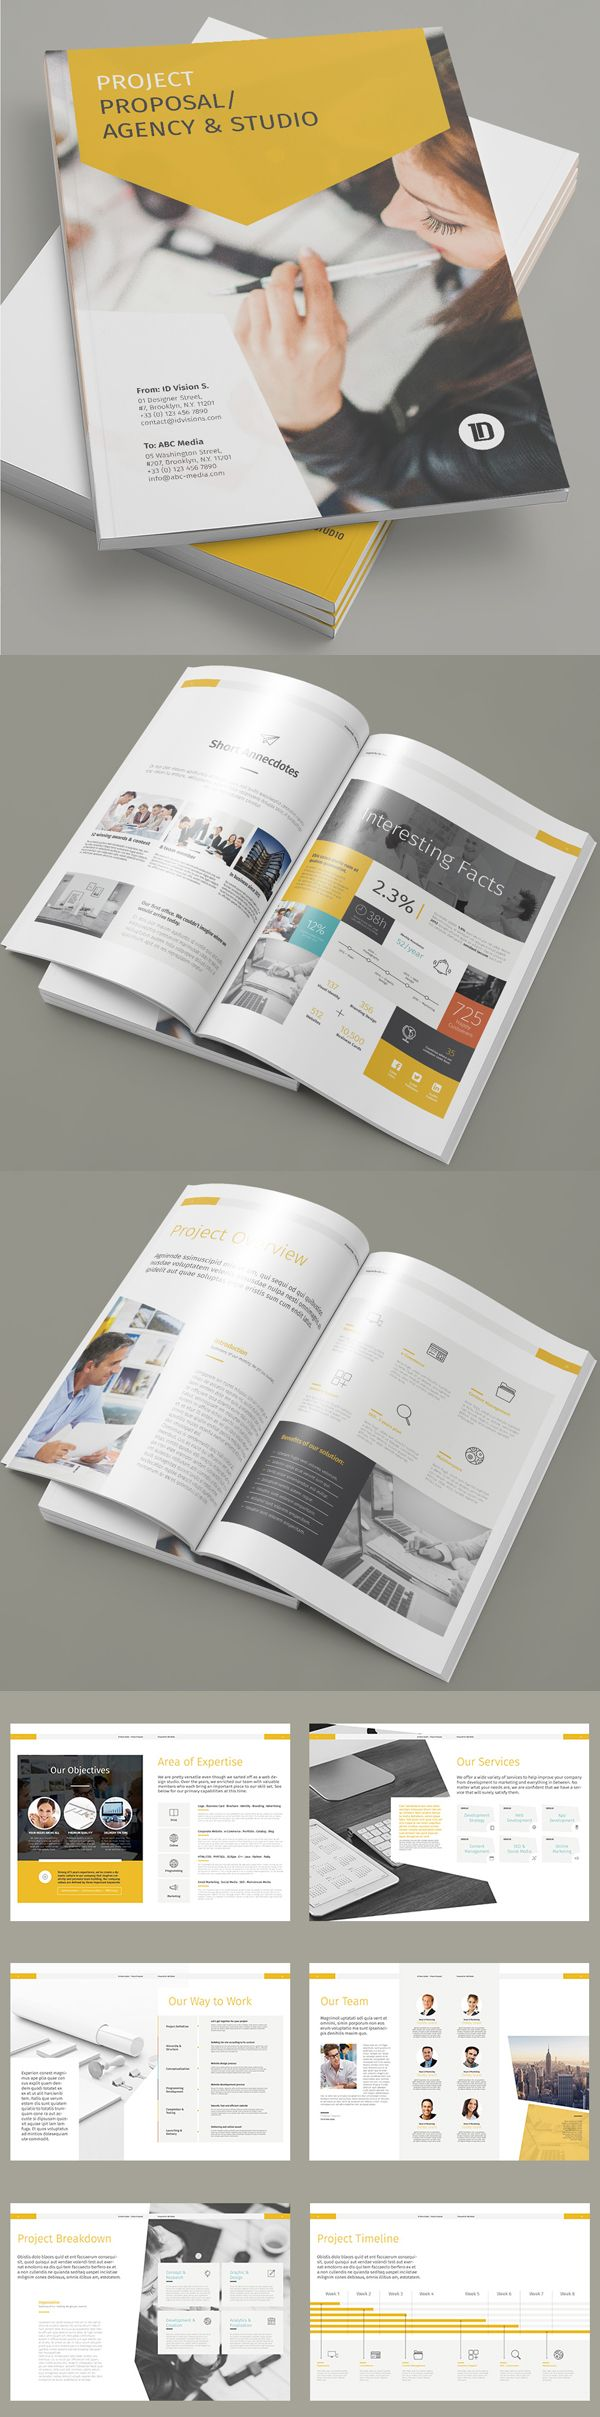 Project Proposal Brochure Template  Brochure Design